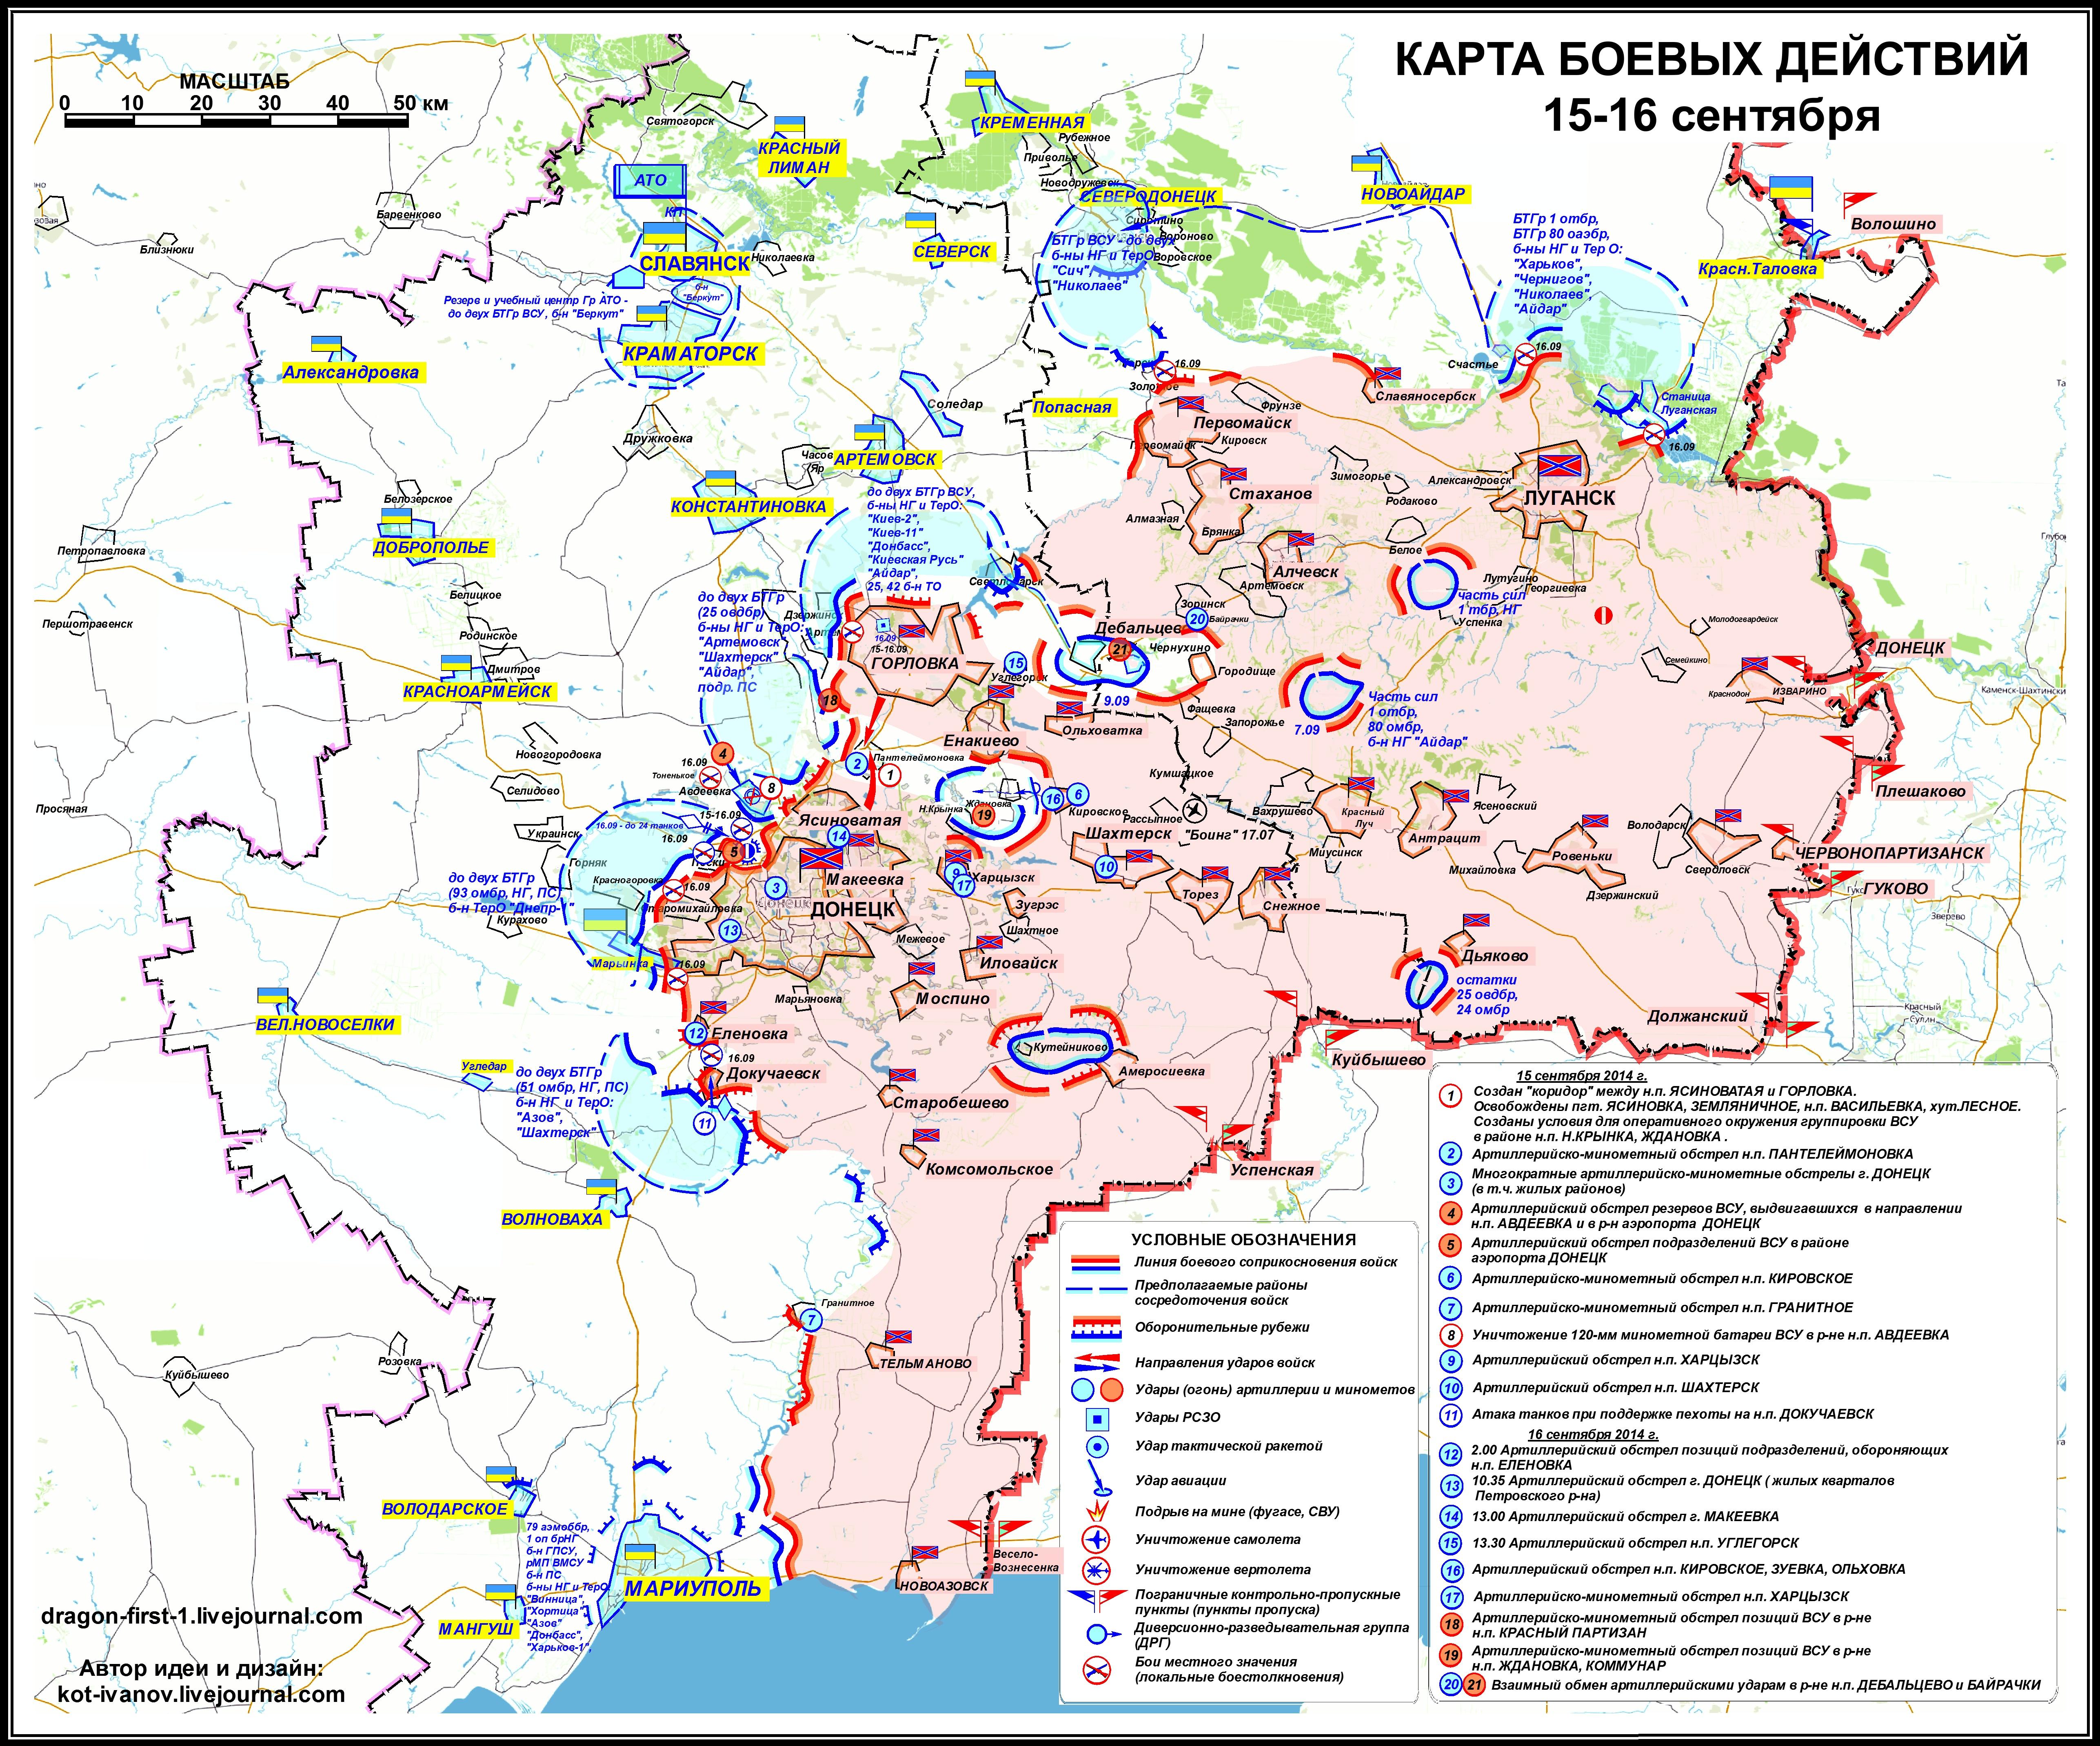 Aktuelle Lage in der Ostukraine (15.-17 September)